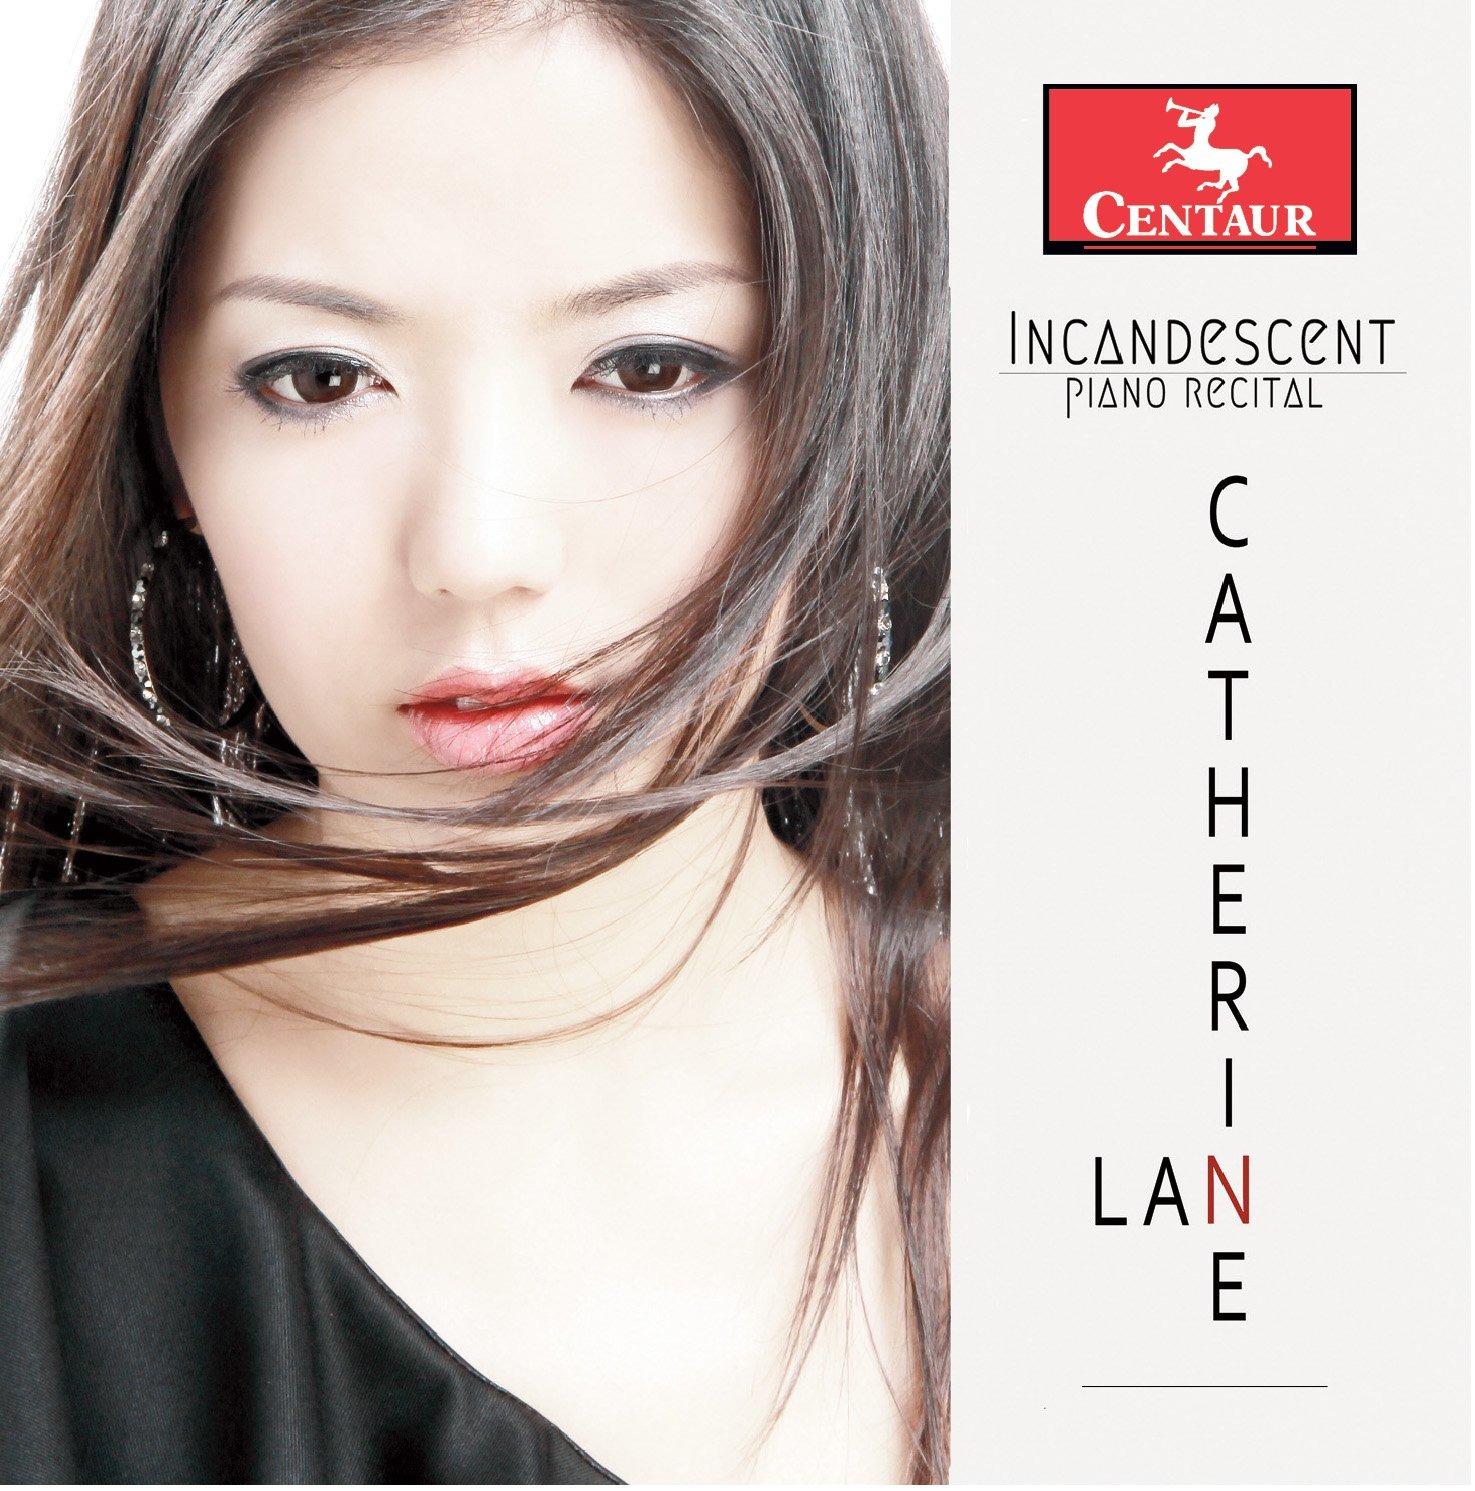 Incandescent Piano Recital - Catherine Lan - Musik - CENTAUR - 0044747345727 - September 9, 2016